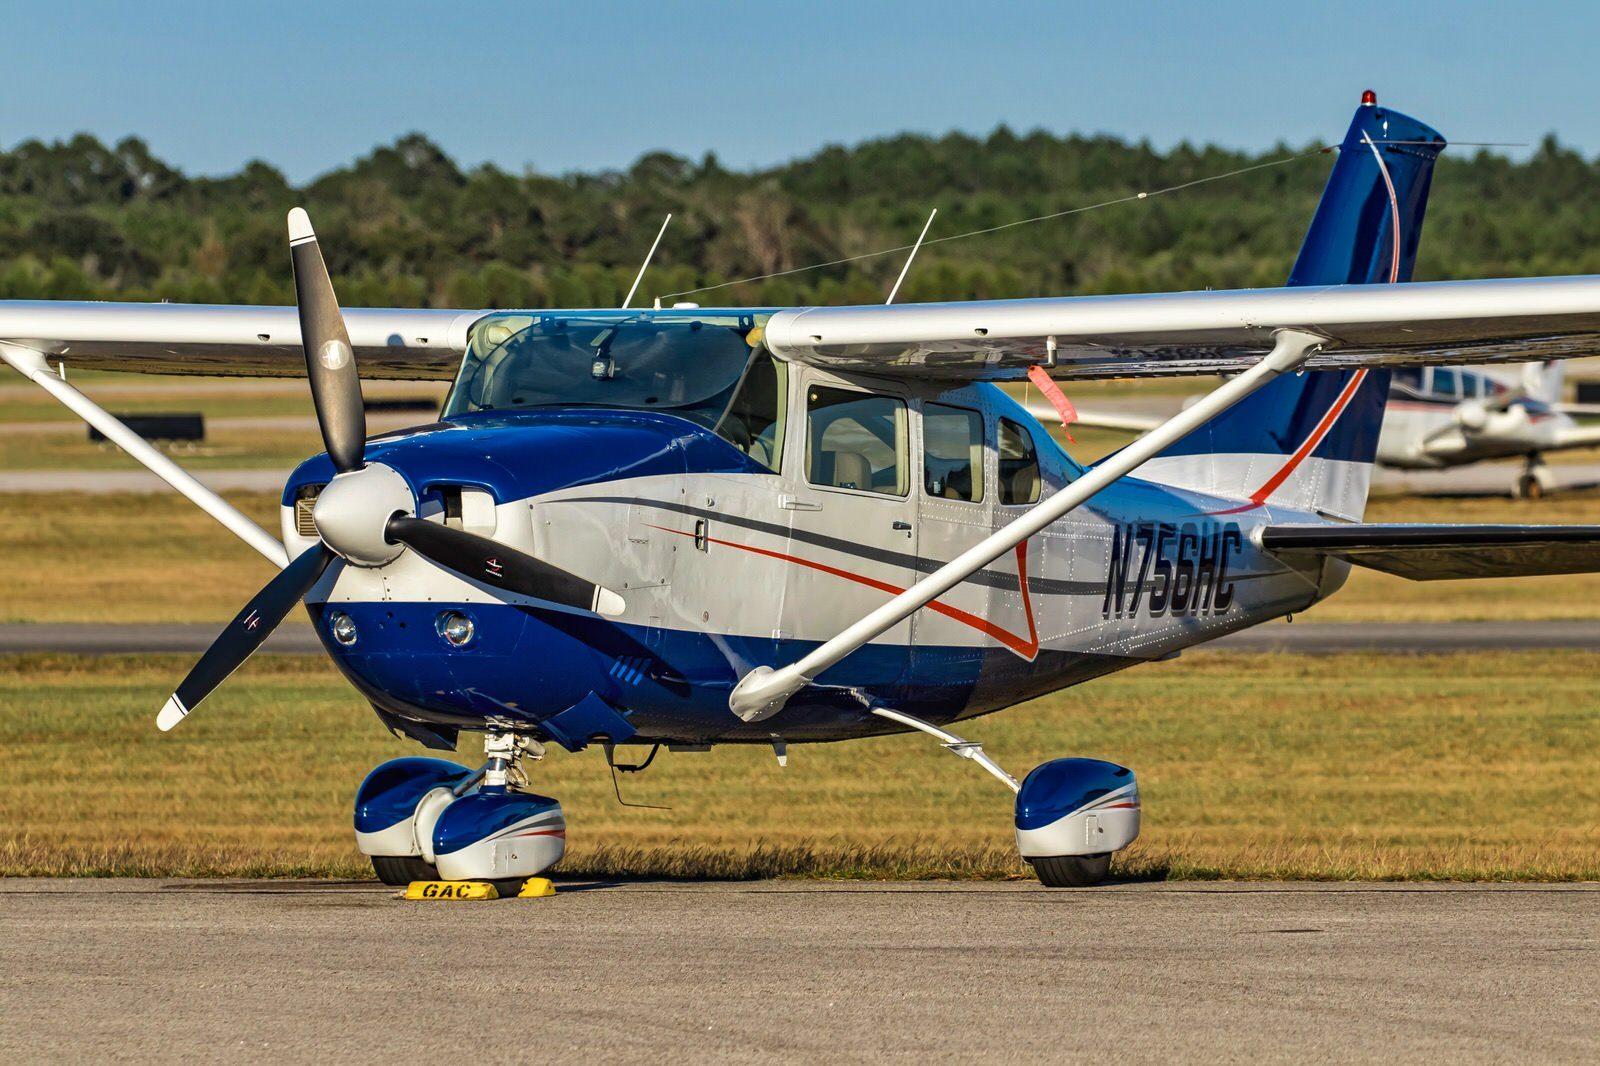 Cessna 206 at JKA